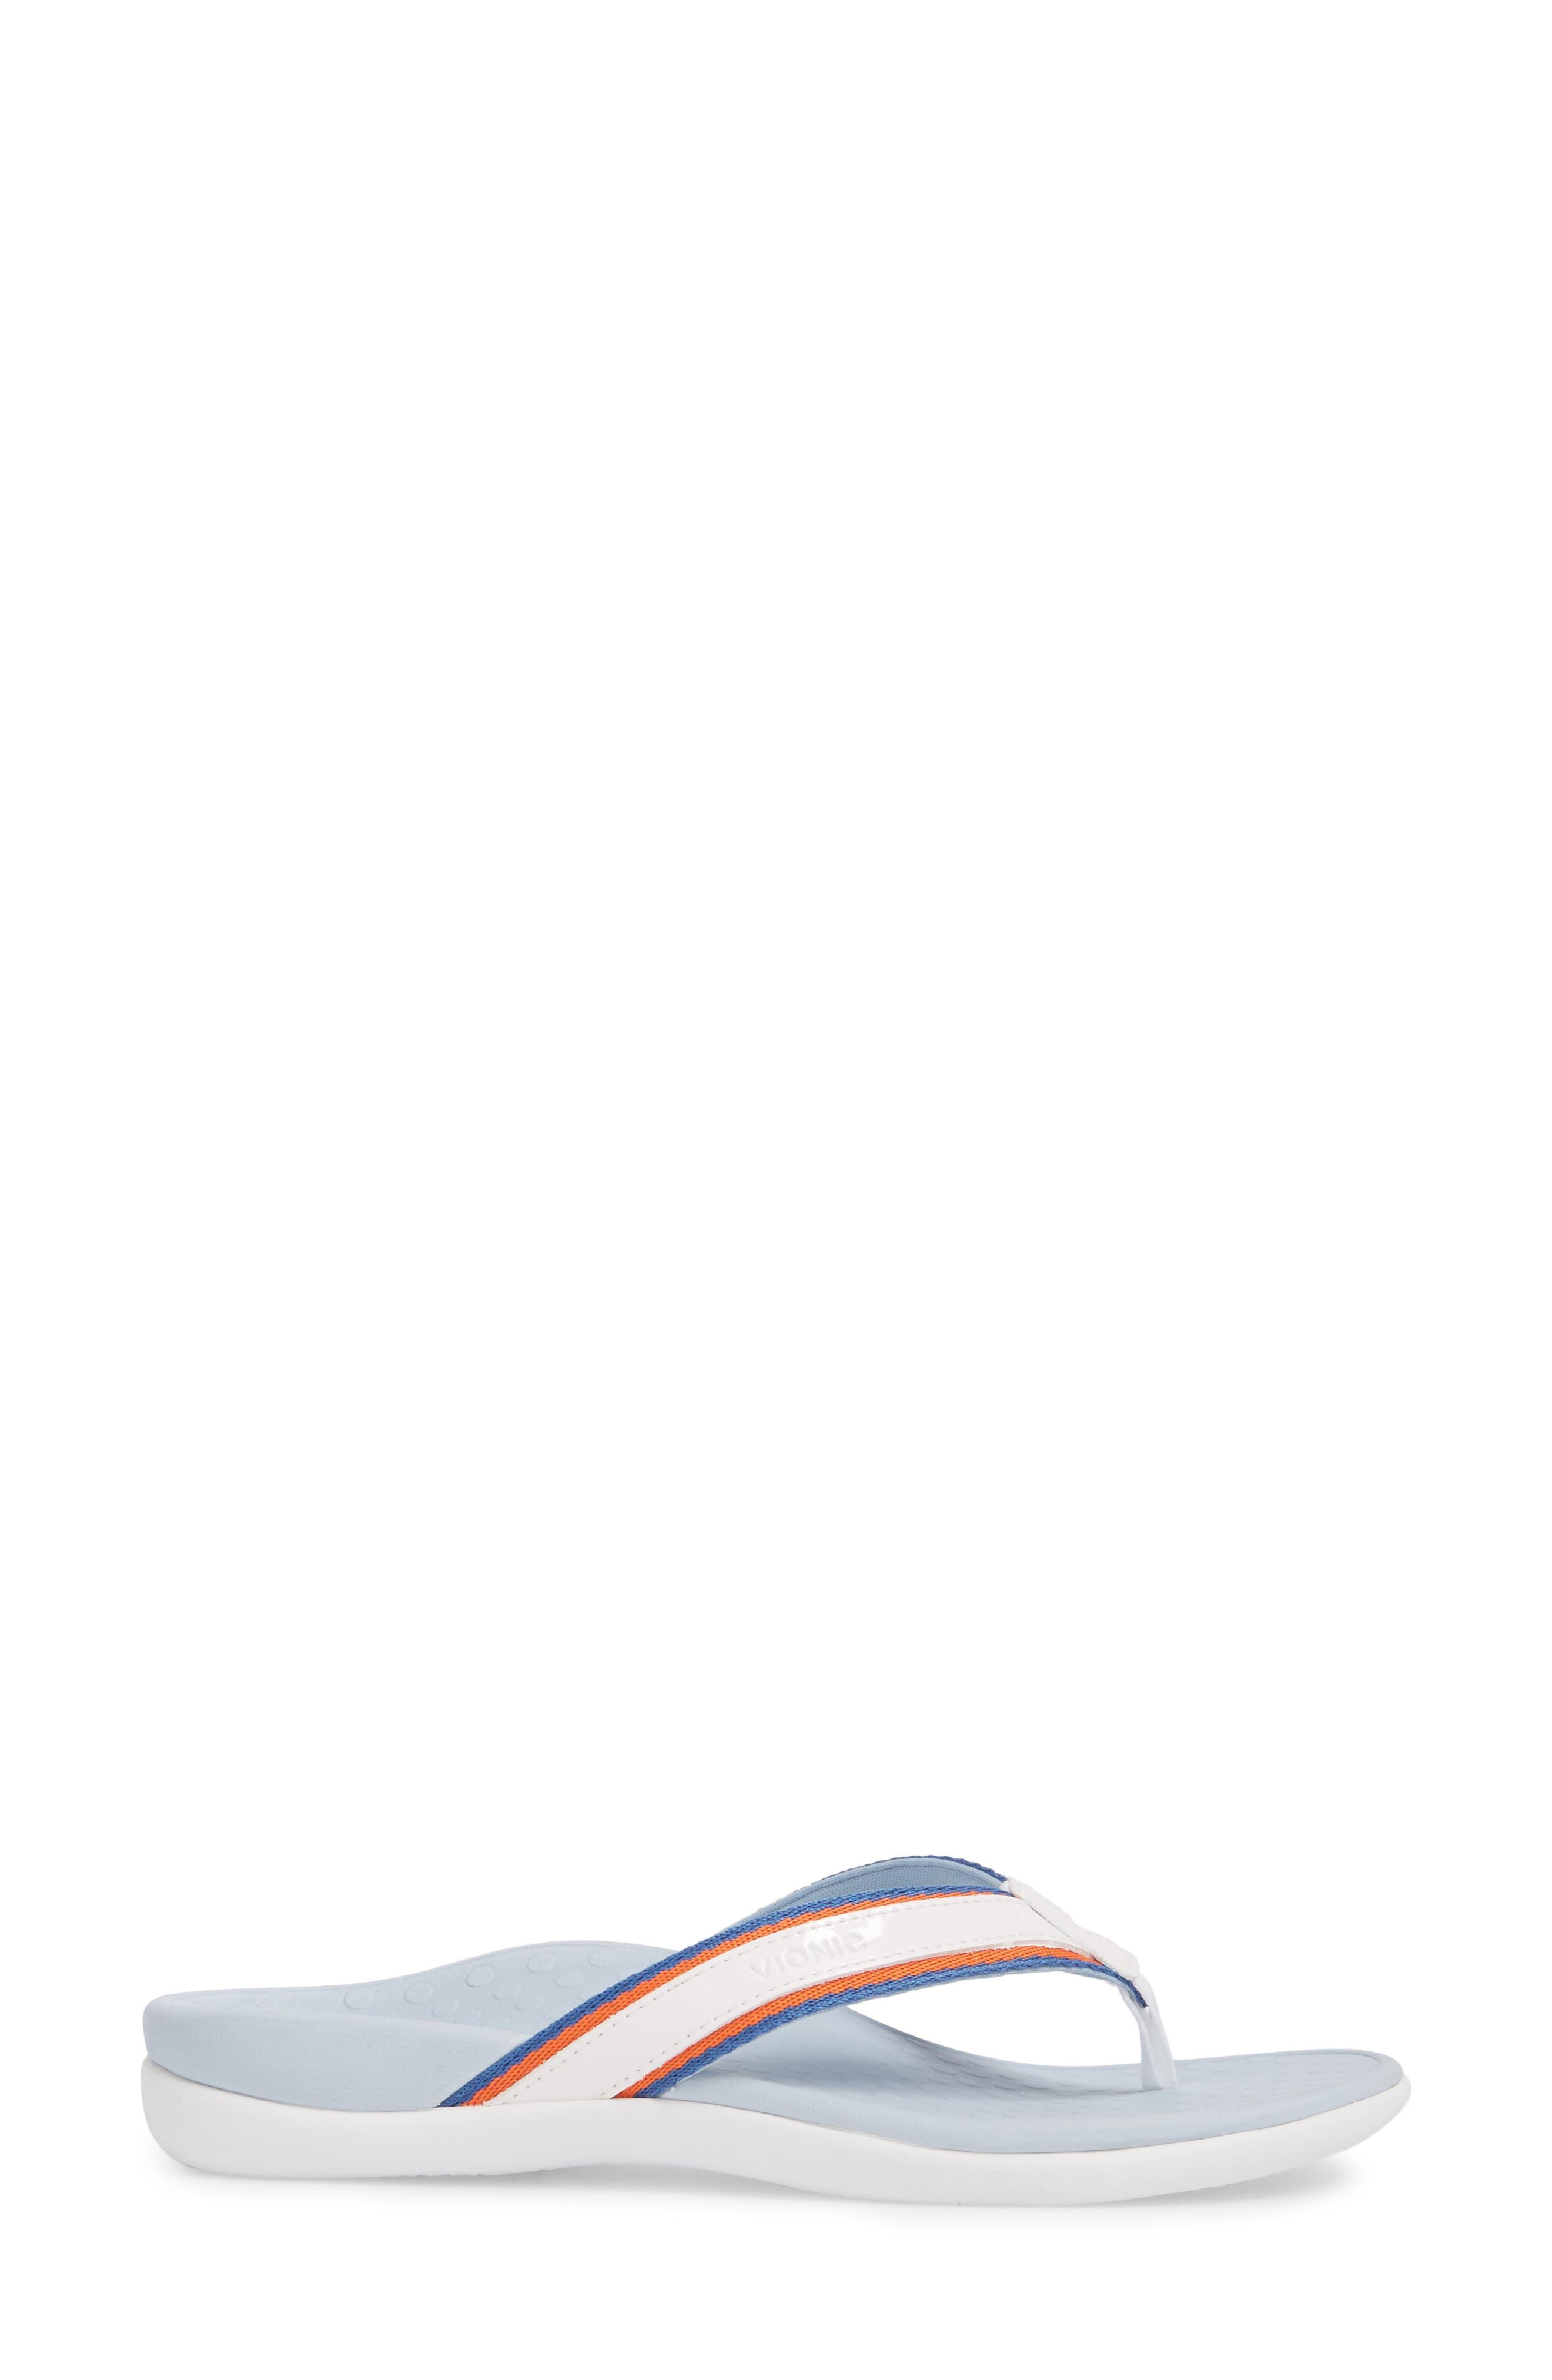 Tide Sport Flip Flop,                             Alternate thumbnail 3, color,                             402